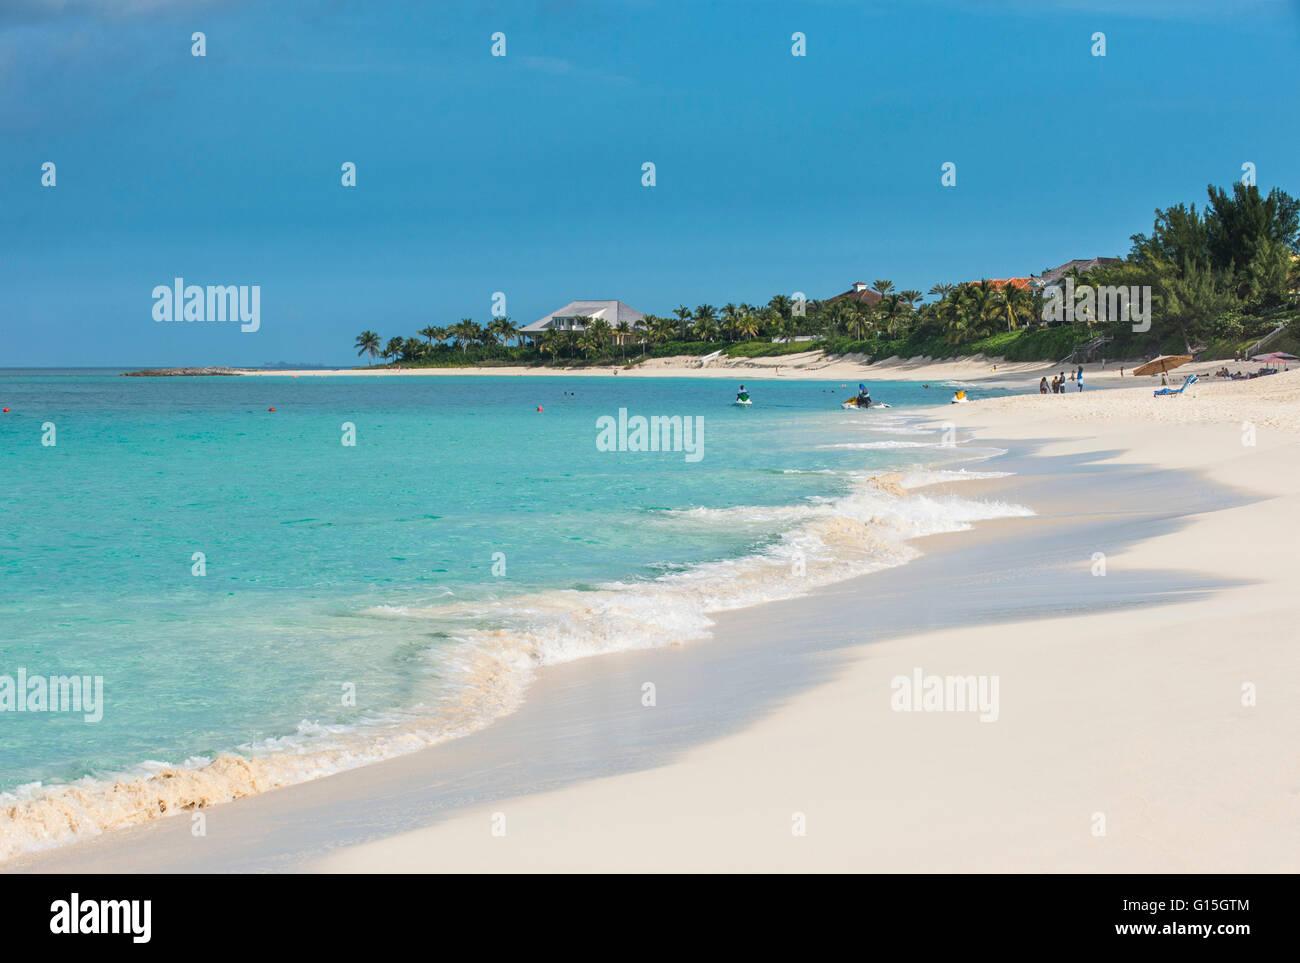 Cabbage beach, Paradise Island, Nassau, New Providence, Bahamas, Caraïbes Photo Stock